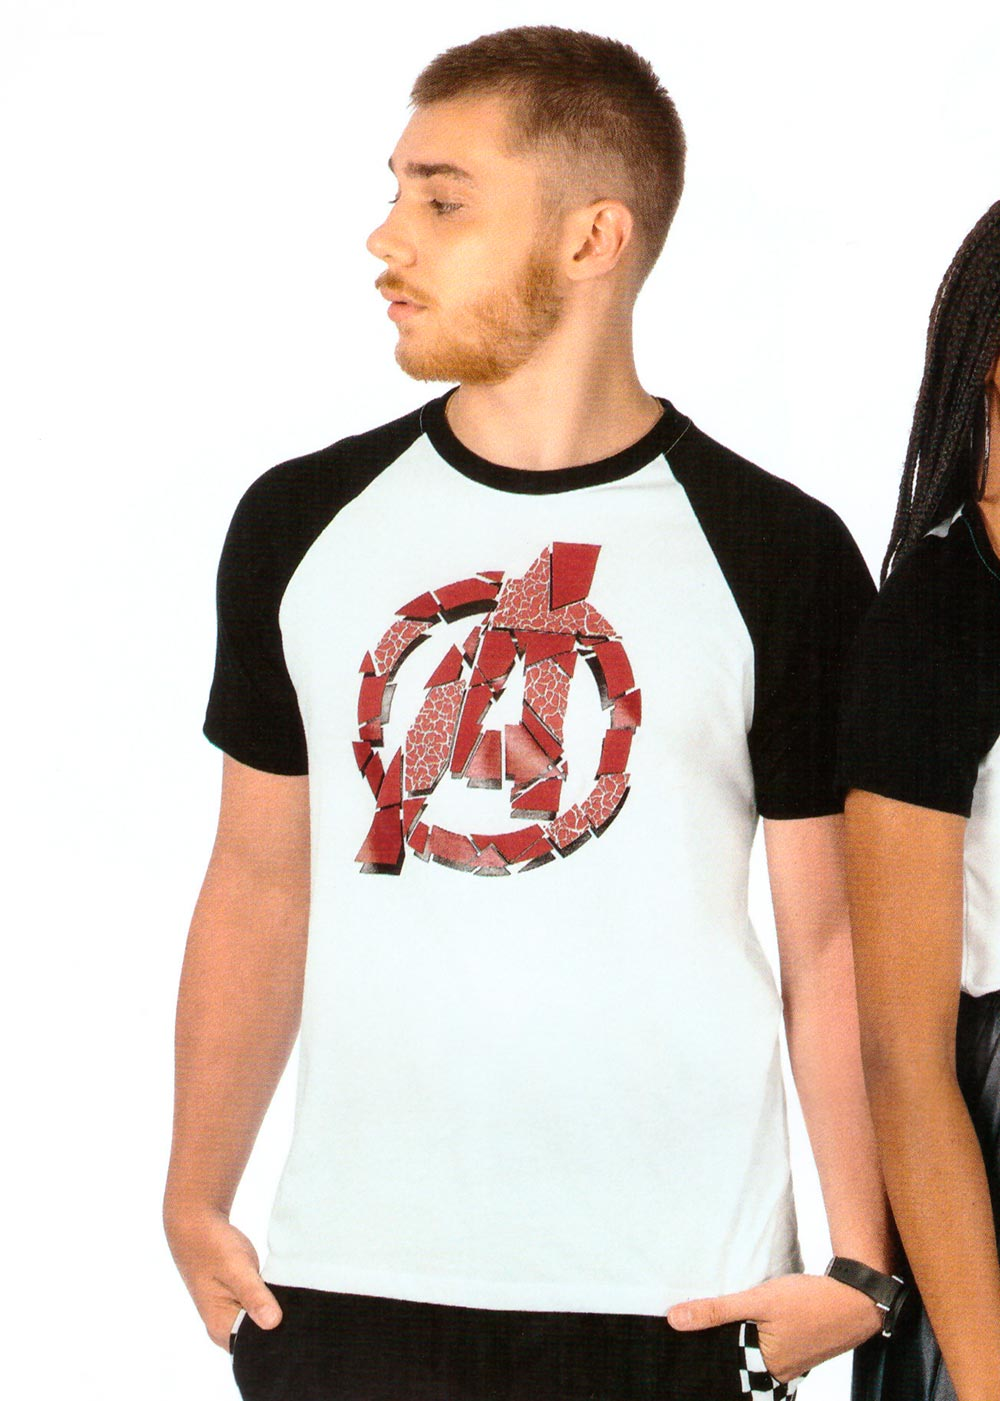 Camiseta Adulto Masculina Verão Branca Avengers Cativa